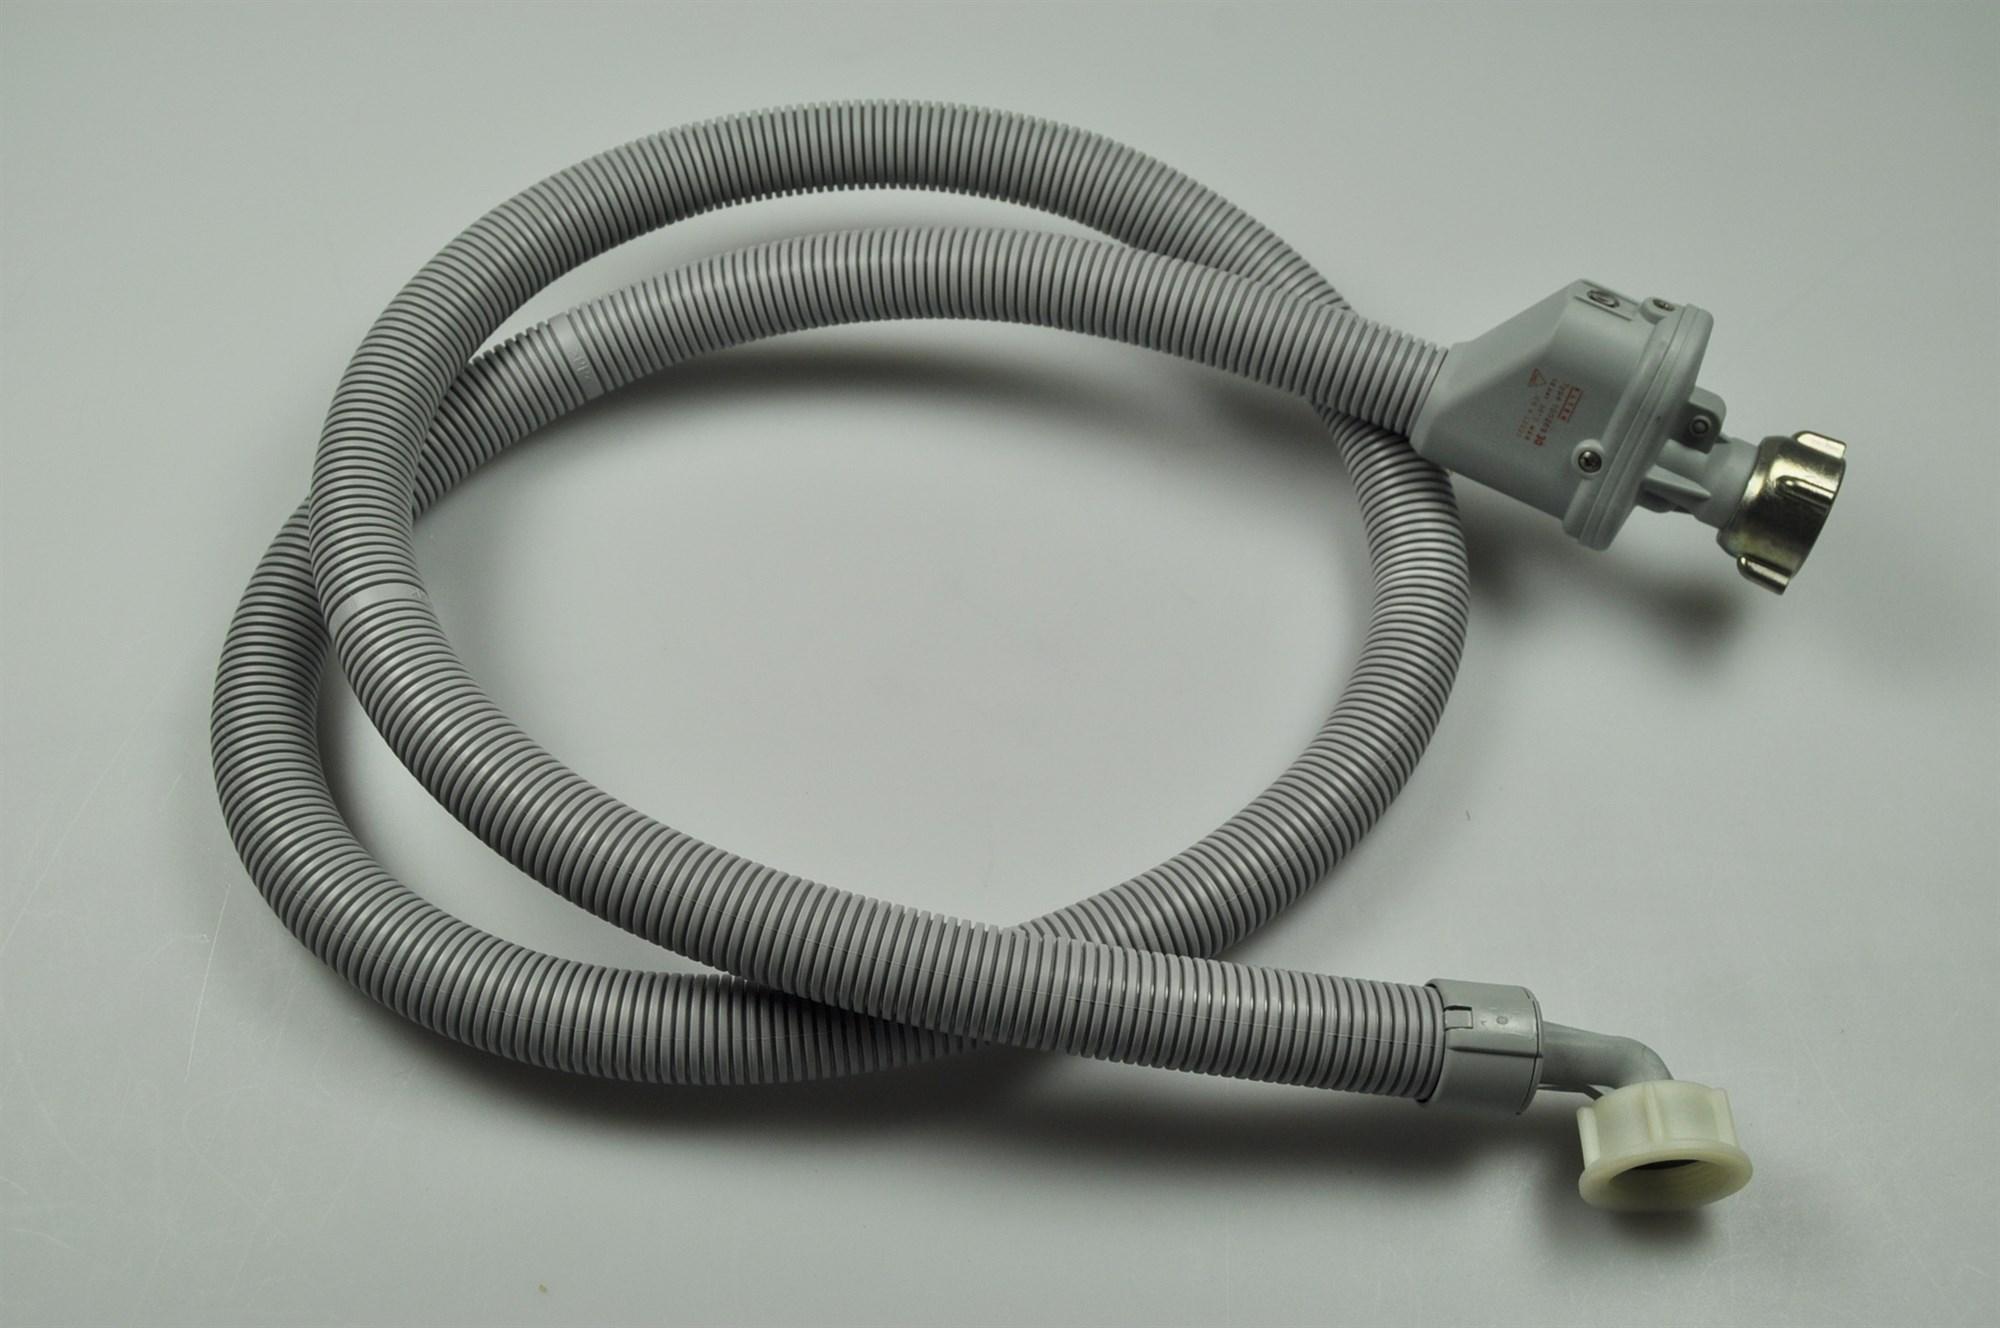 Omtyckta Aquastop-slang, Universal diskmaskin - 2500 mm JU-22